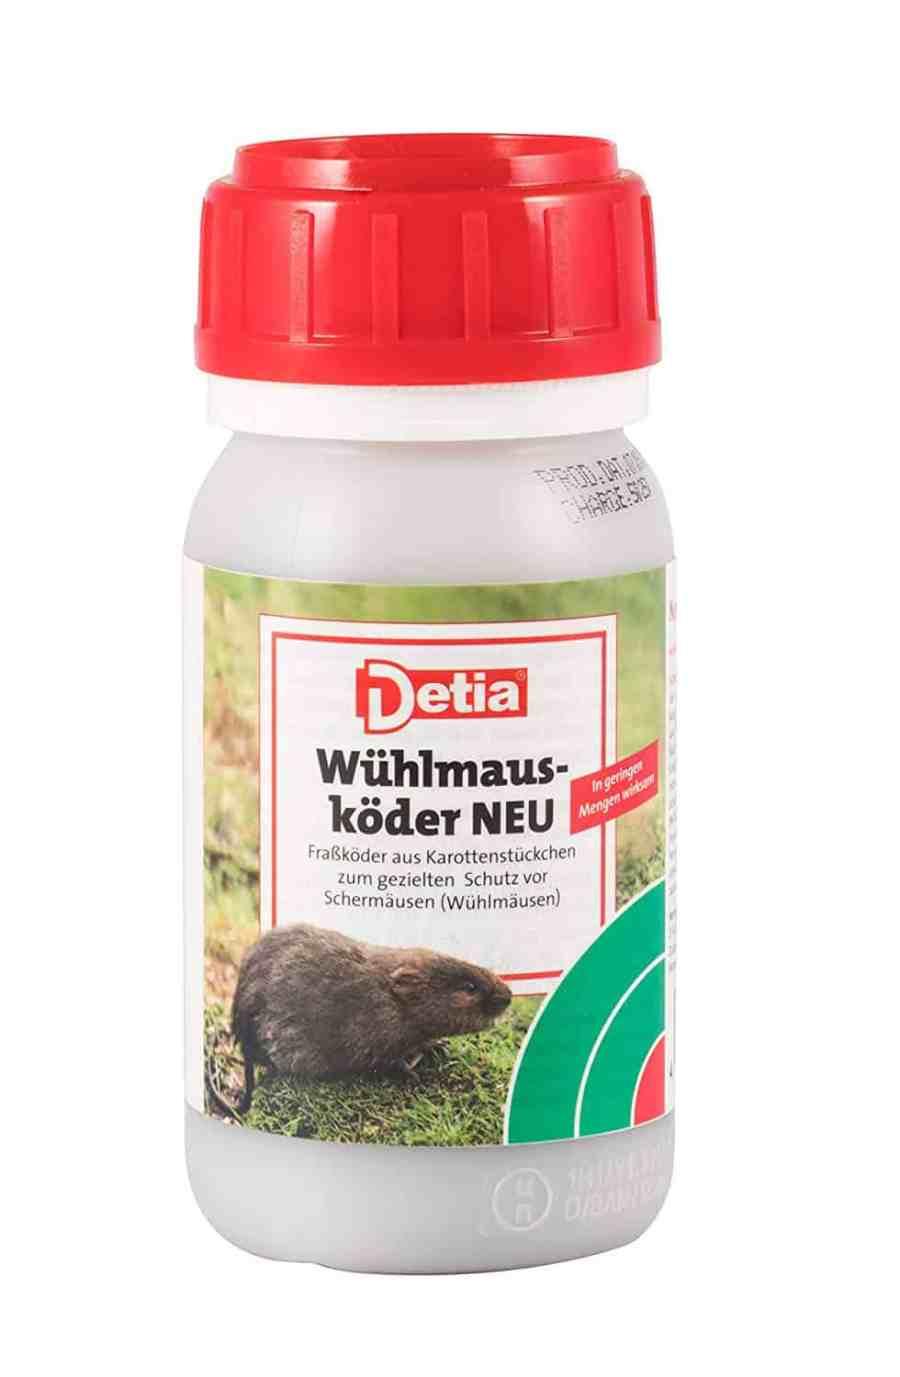 Detia Wühlmausköder Zinkphosphid. 90 g